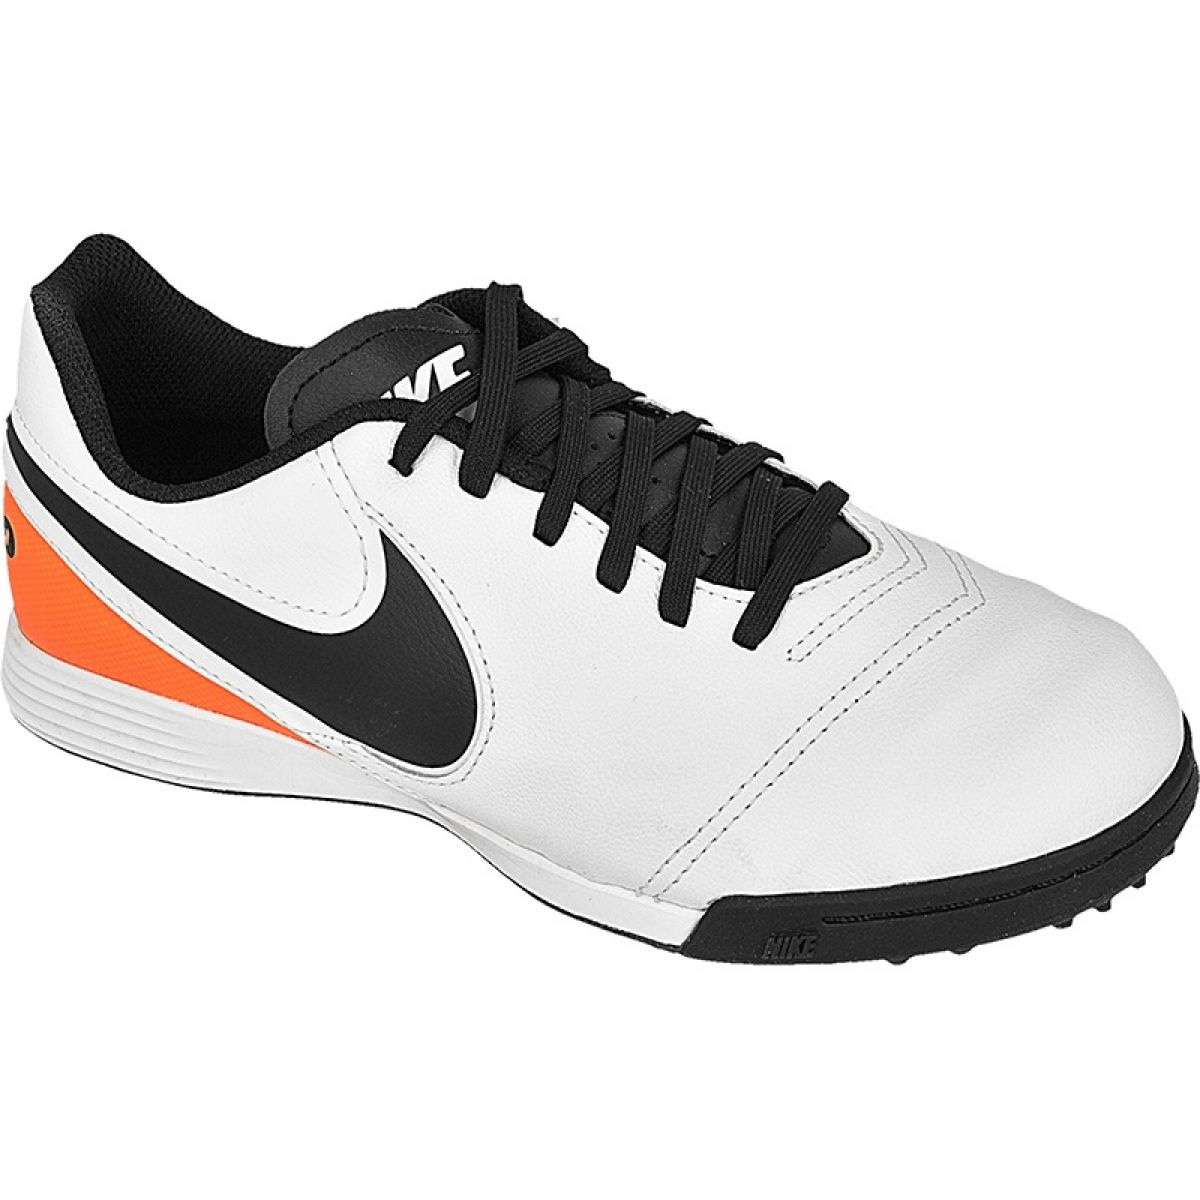 galería Tesauro Respetuoso del medio ambiente  Football boots Nike Tiempo Legend Vi Tf Jr 819191-108 multicolored white -  ButyModne.pl